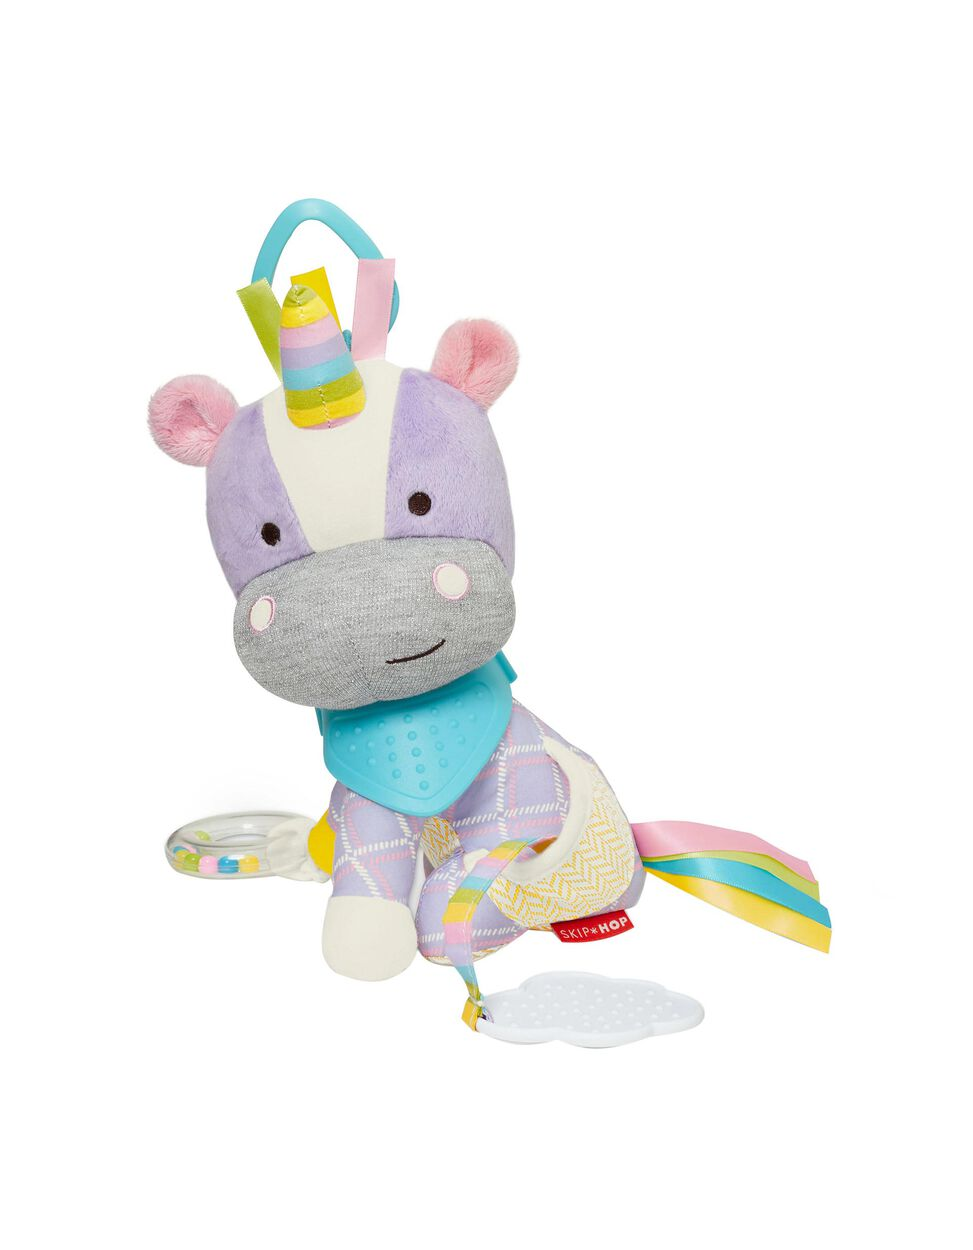 Brinquedo Buddies Unicorn Skiphop